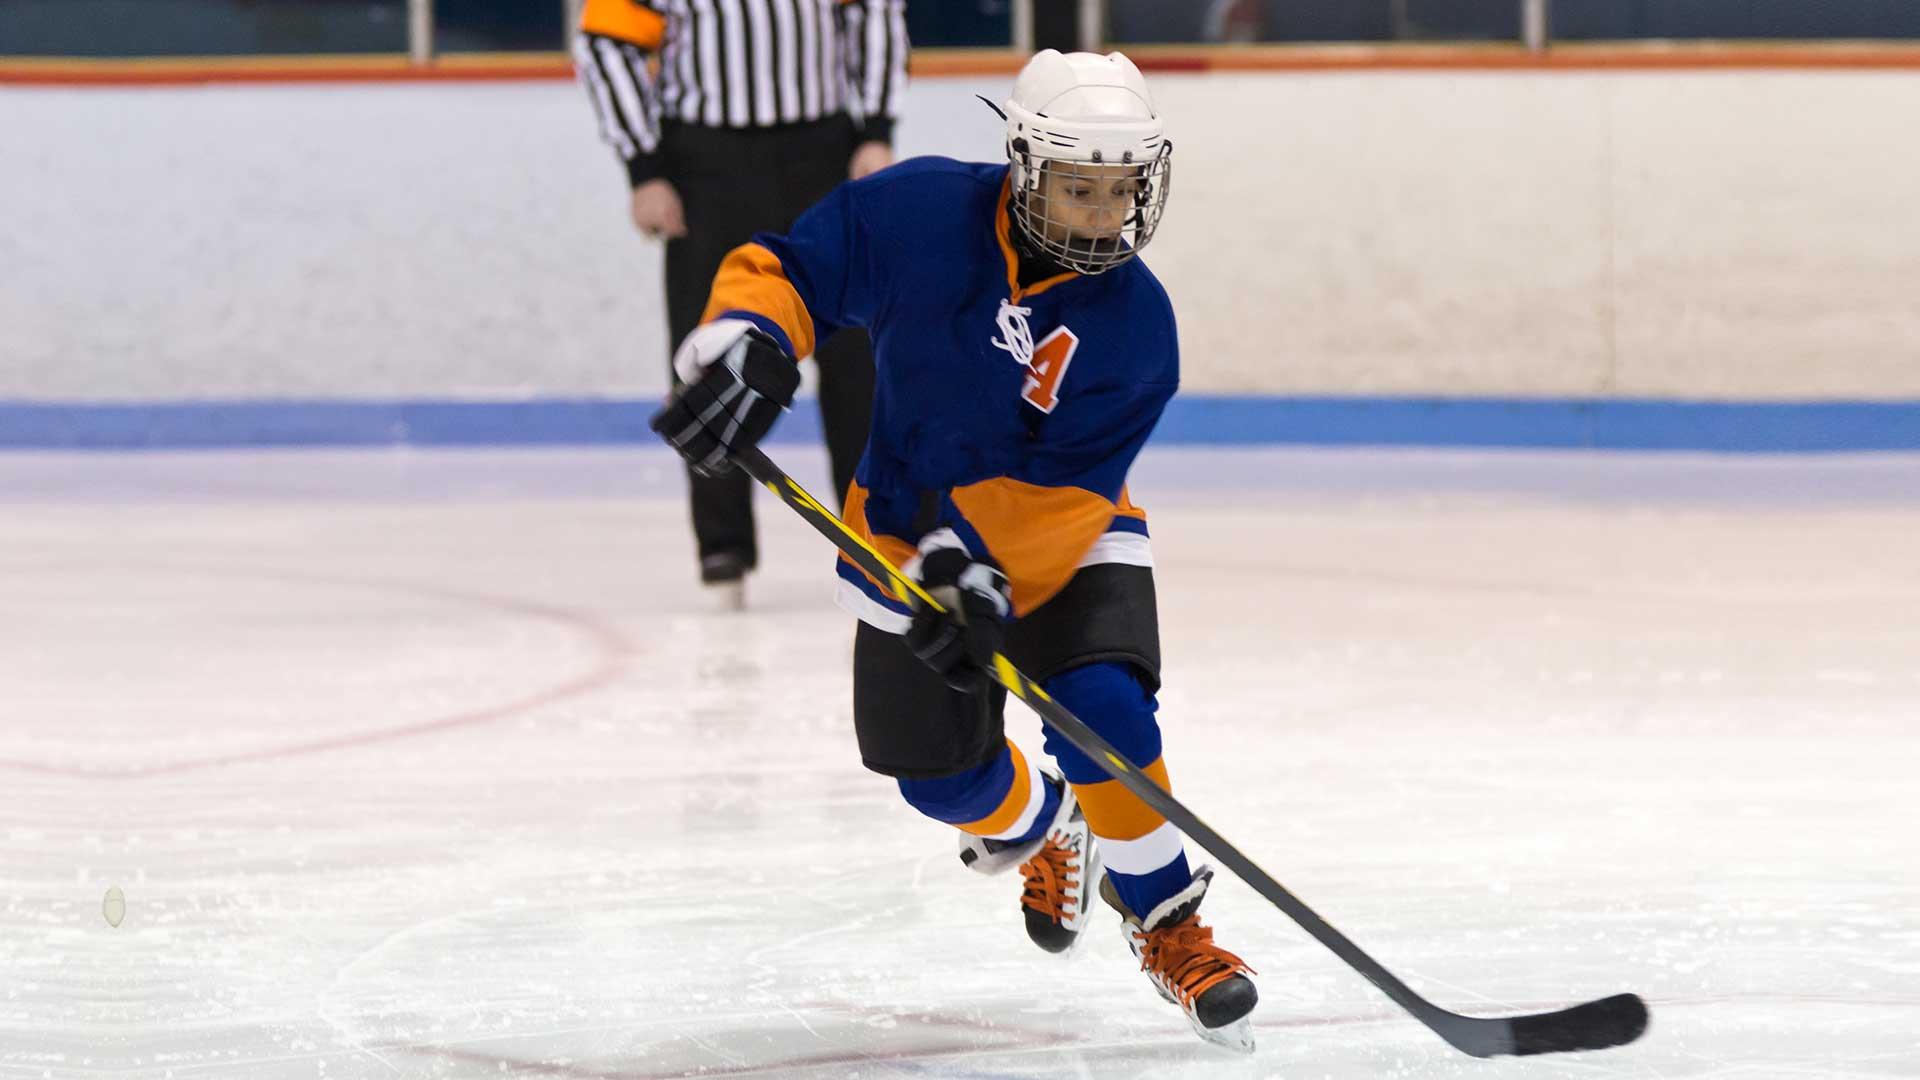 4-Year-Old-Hockey-Player-from-Edina-Scores-Fifth-Nhl-Goal.jpg